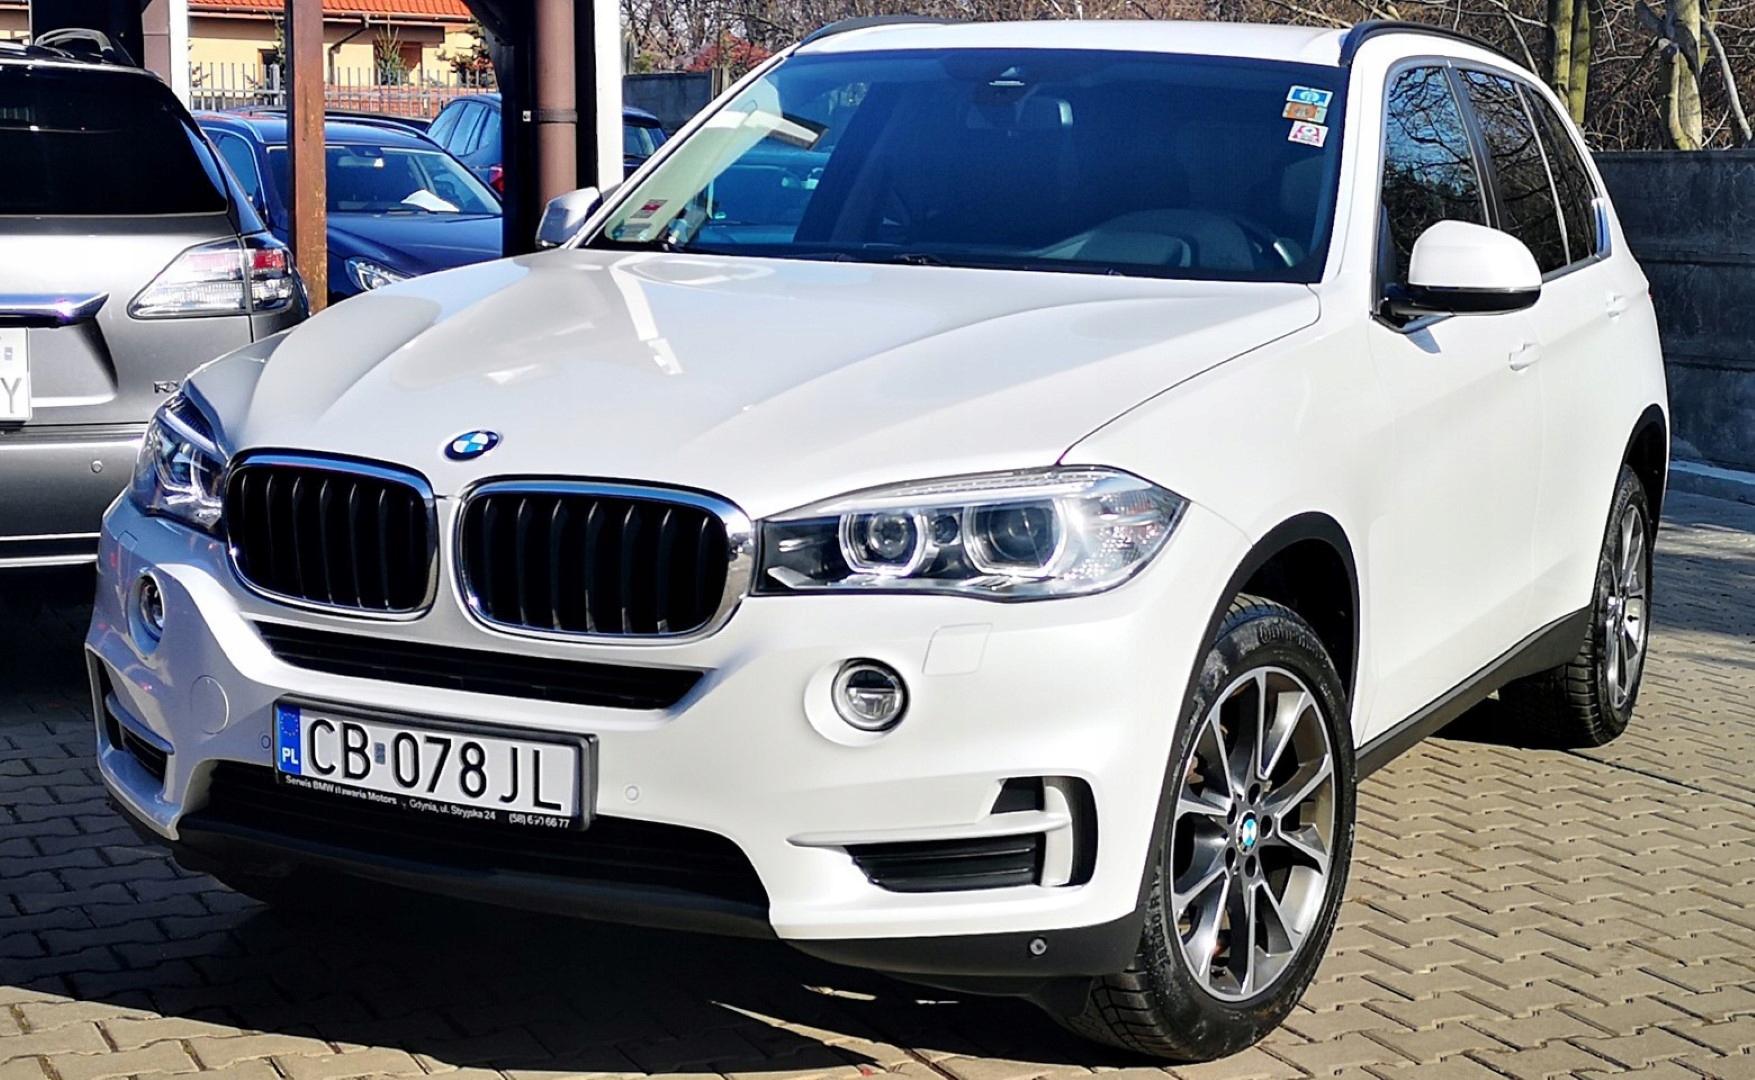 BMW X5 Salon PL 1 ręka Oryg.Lakier ASO Biała Perła